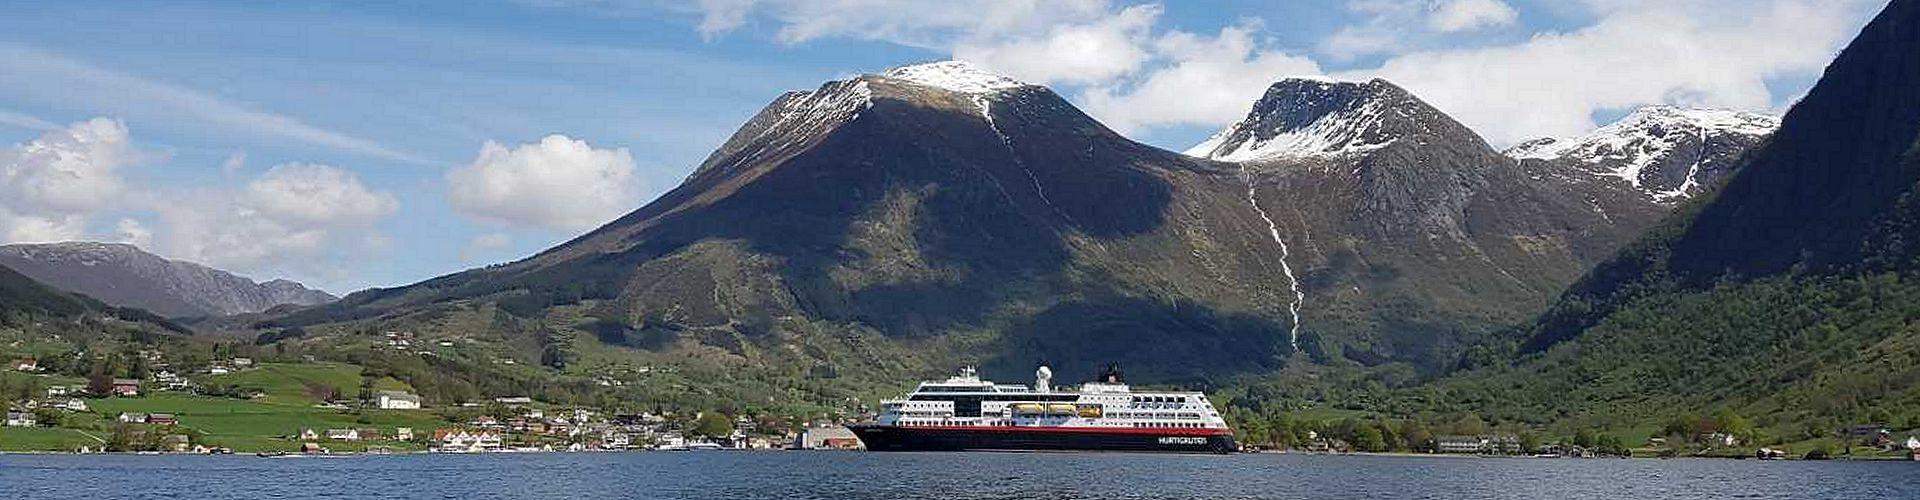 Reisetipps zum Thema: Hurtigruten